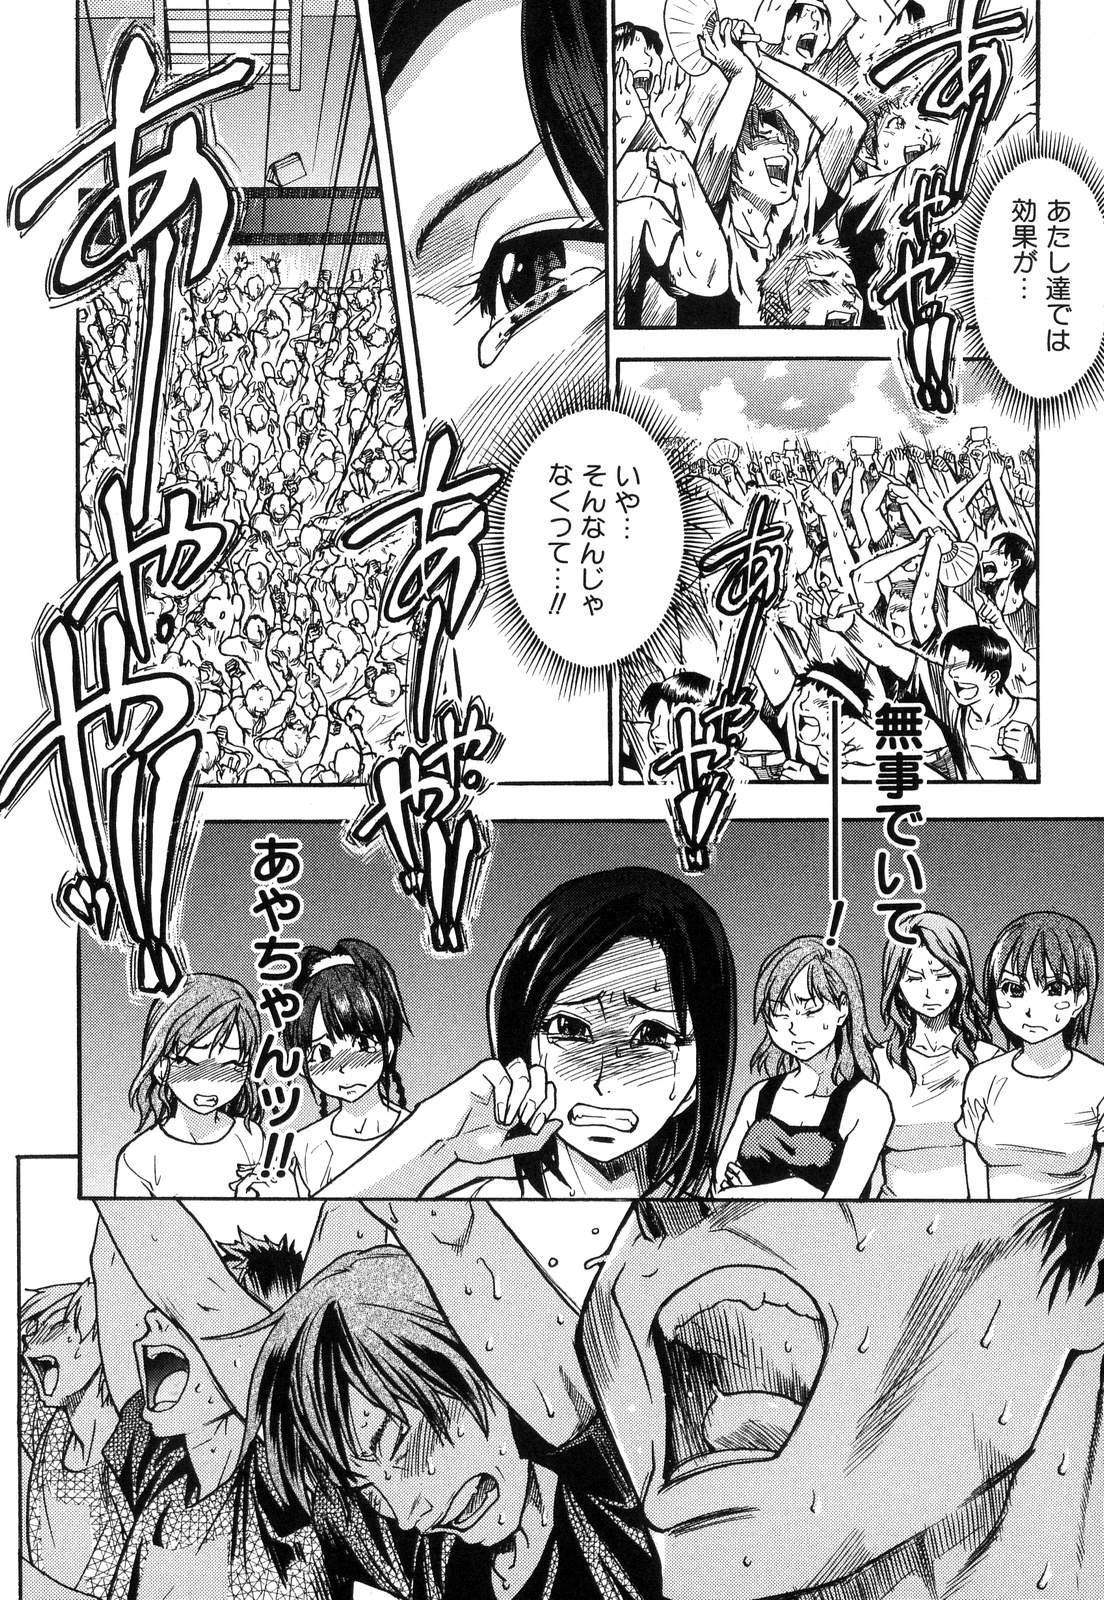 Shining Musume. 6. Rainbow Six 176